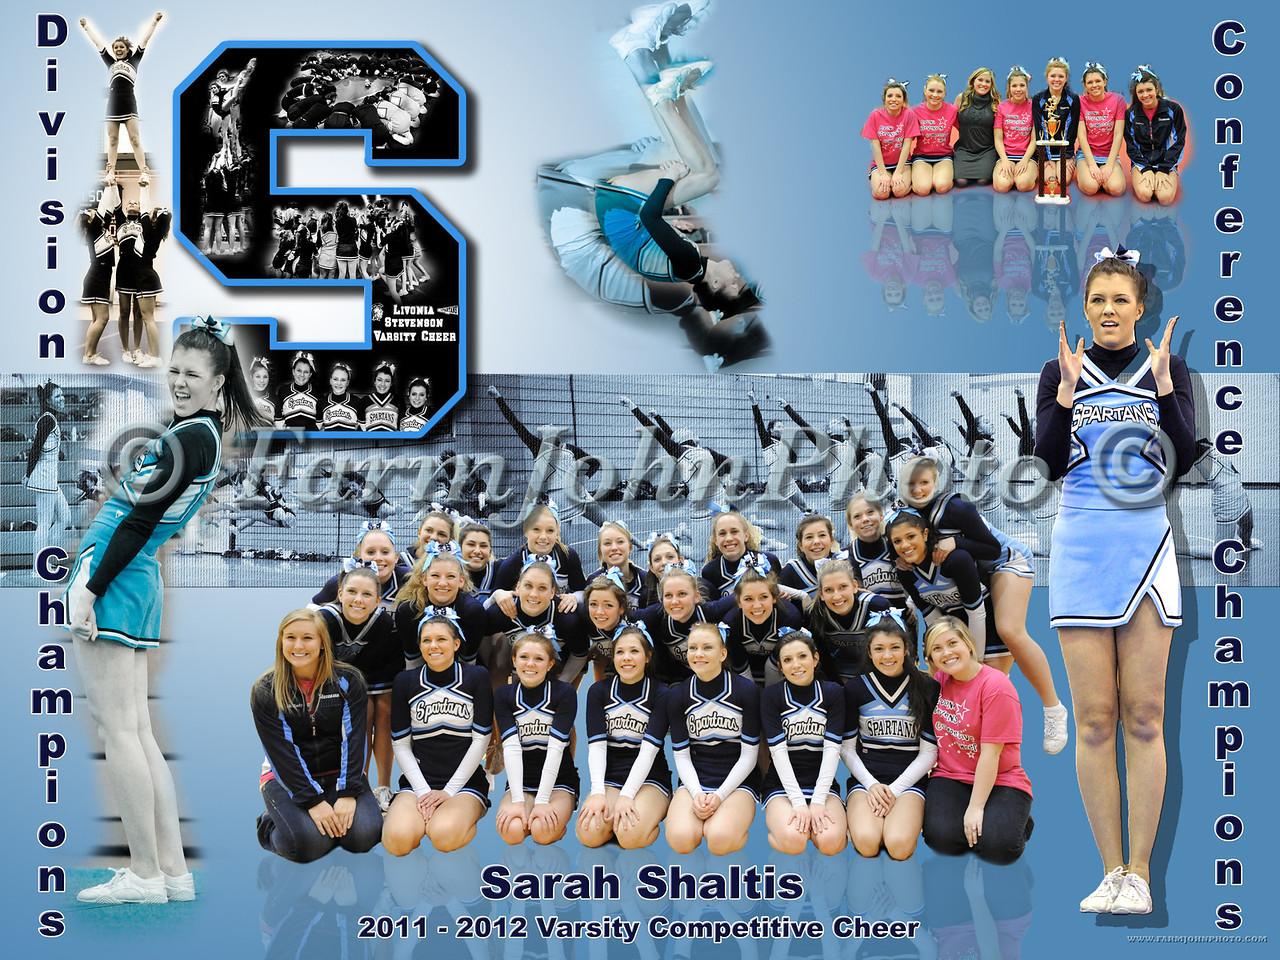 Sarah Shaltis 24 x 18 Format Proof 5